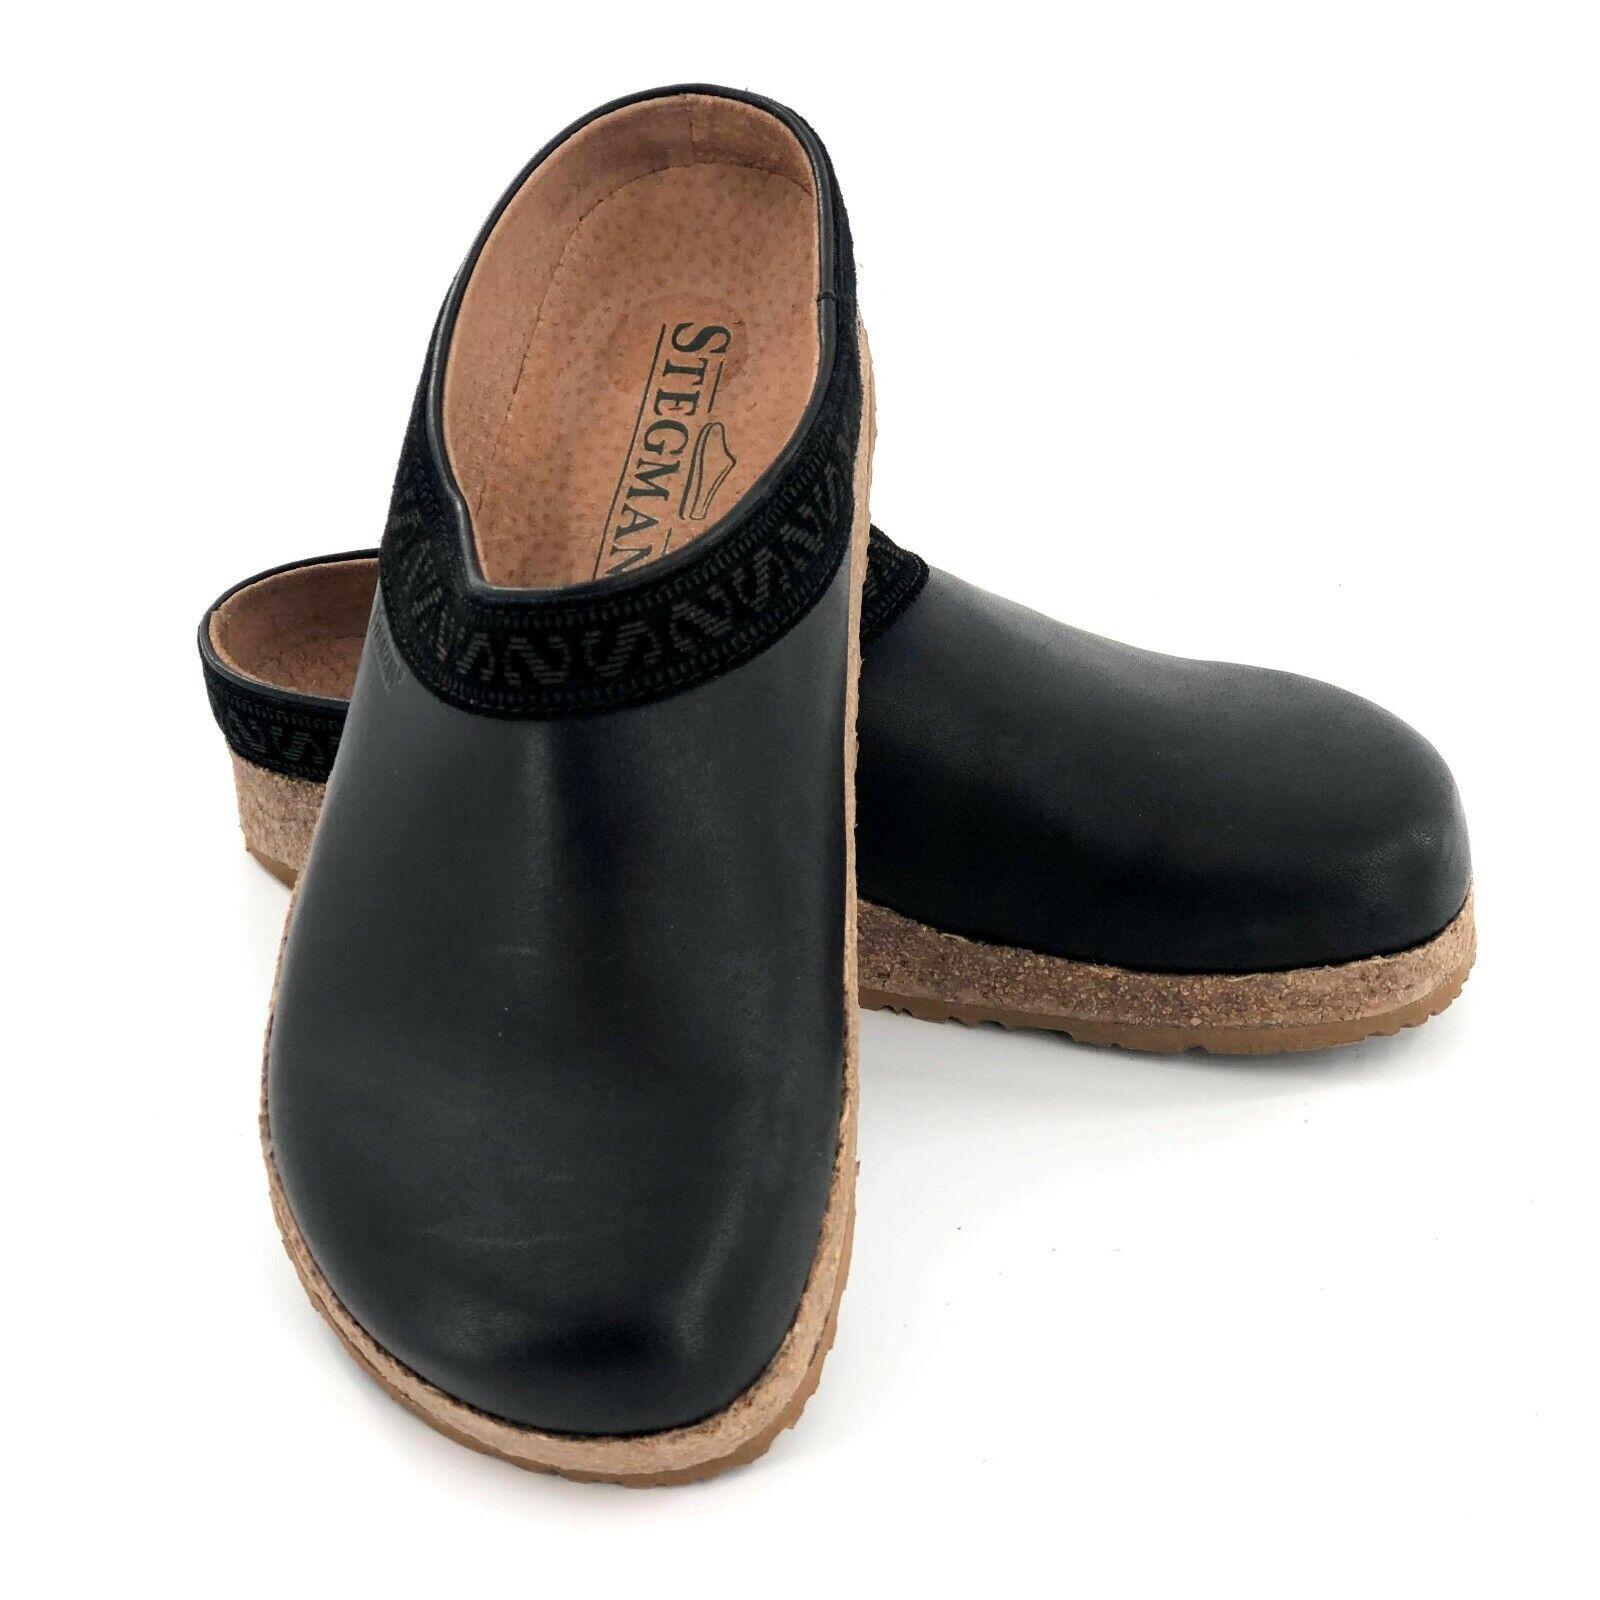 Stegmann Black Leather Clogs Womens Comfort Slip On Shoes Size 6 US